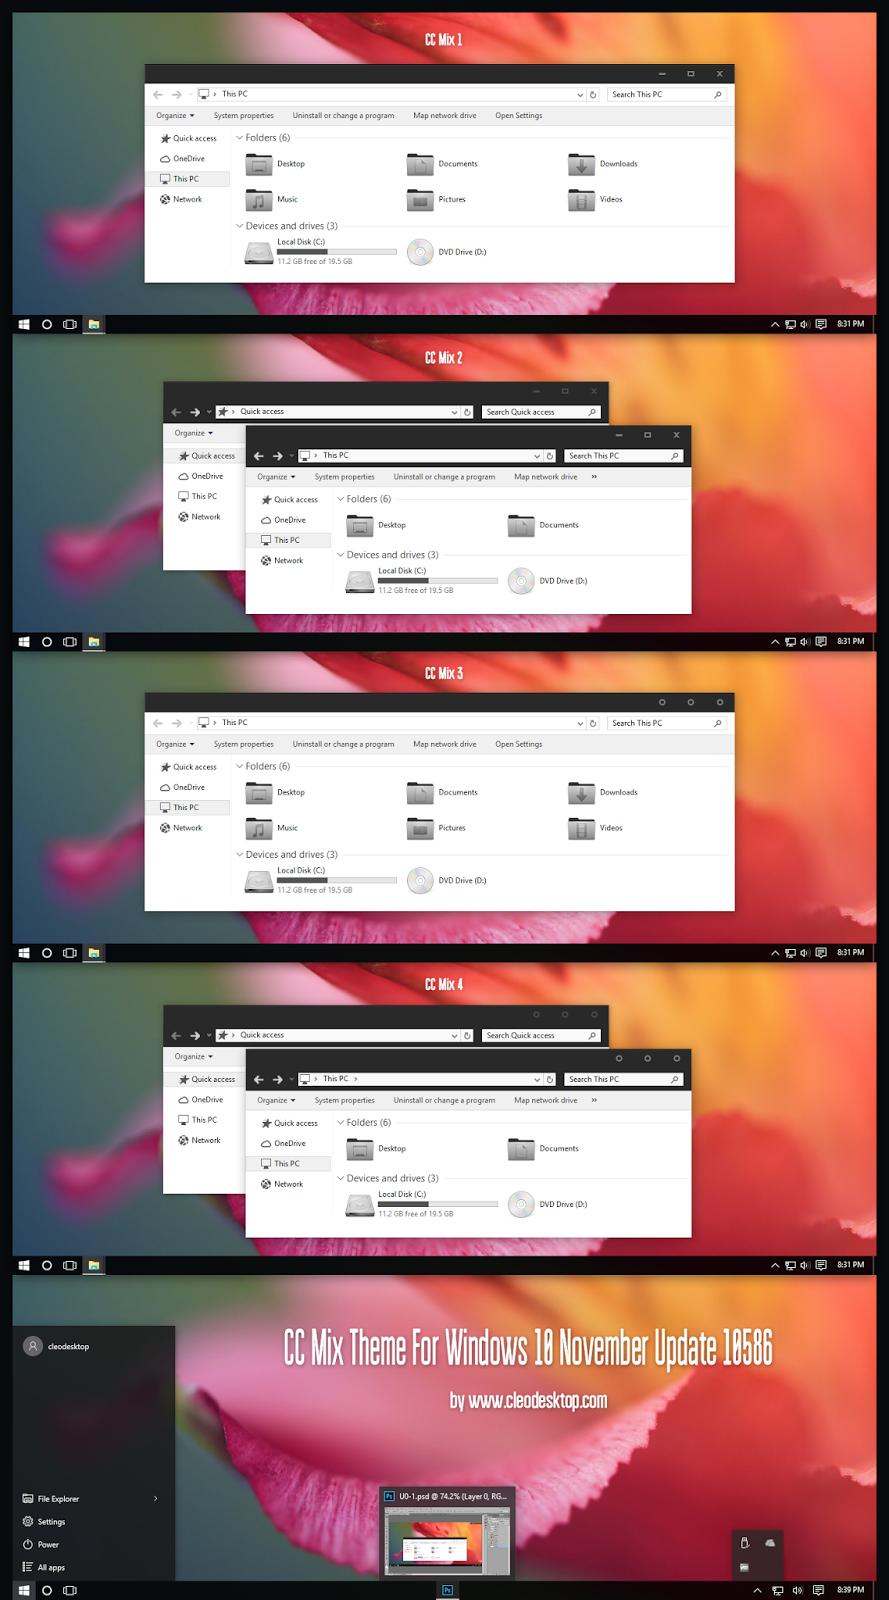 CC Mix Theme For Windows10 November Update (10586)